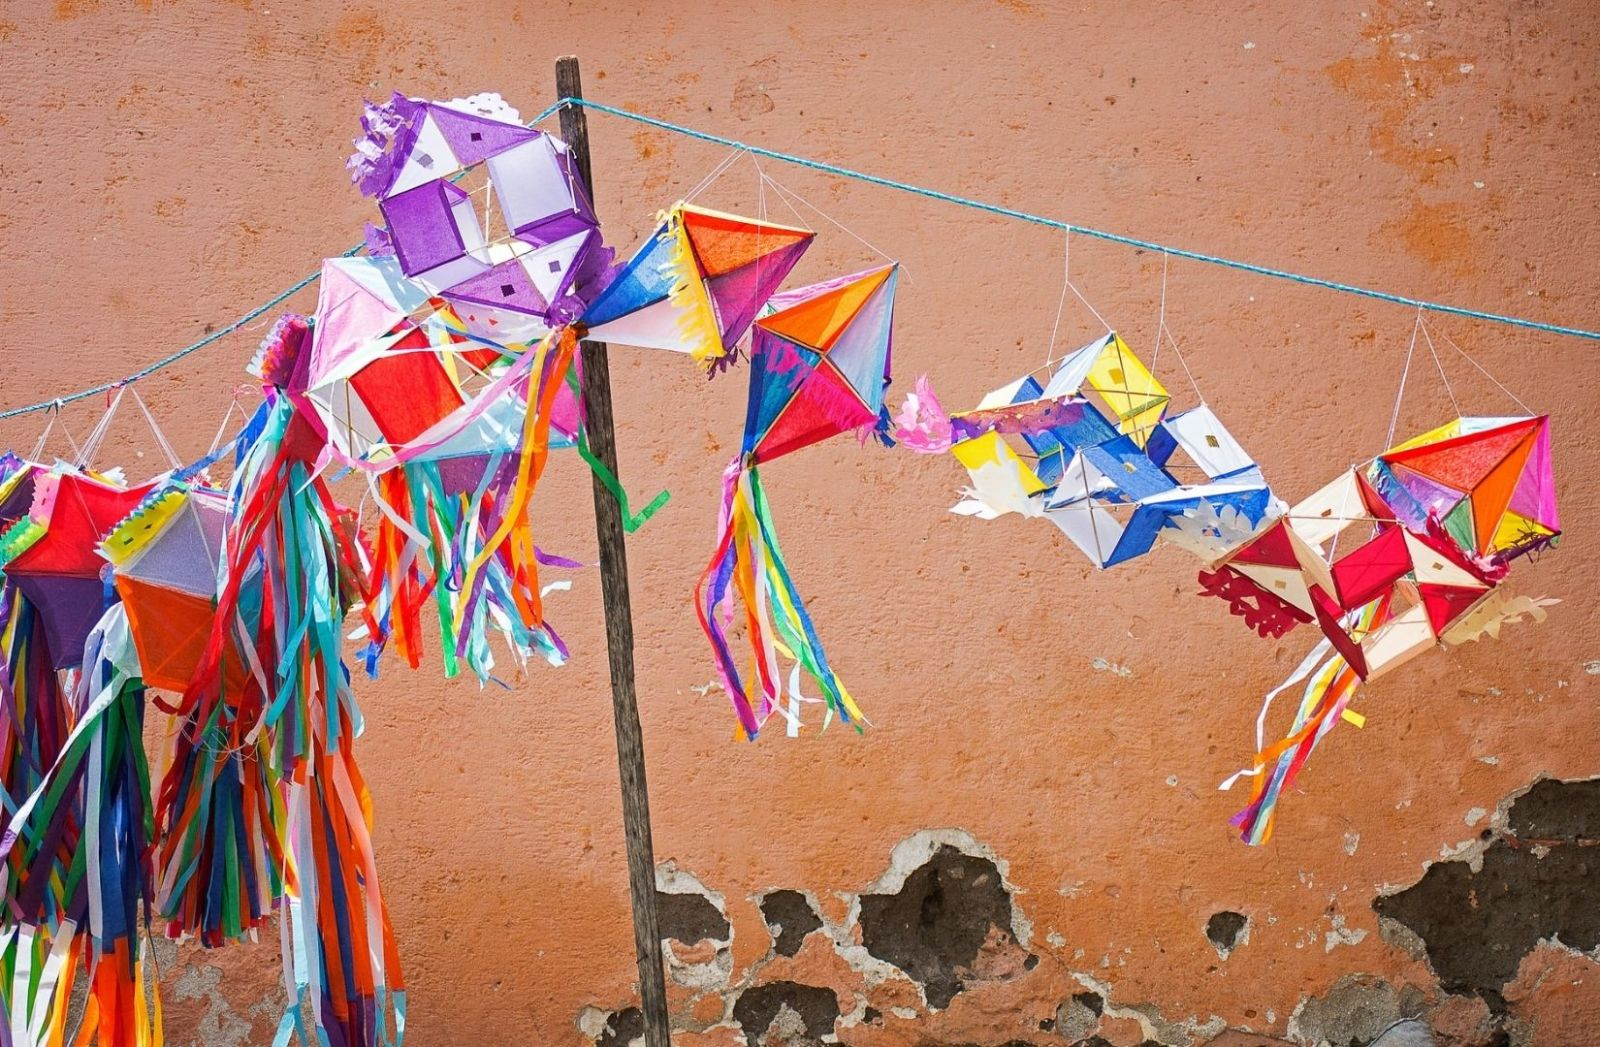 Traditionelle Dekoration in Guatemala. (Foto: Ronald Cuyan, Unsplash.com)